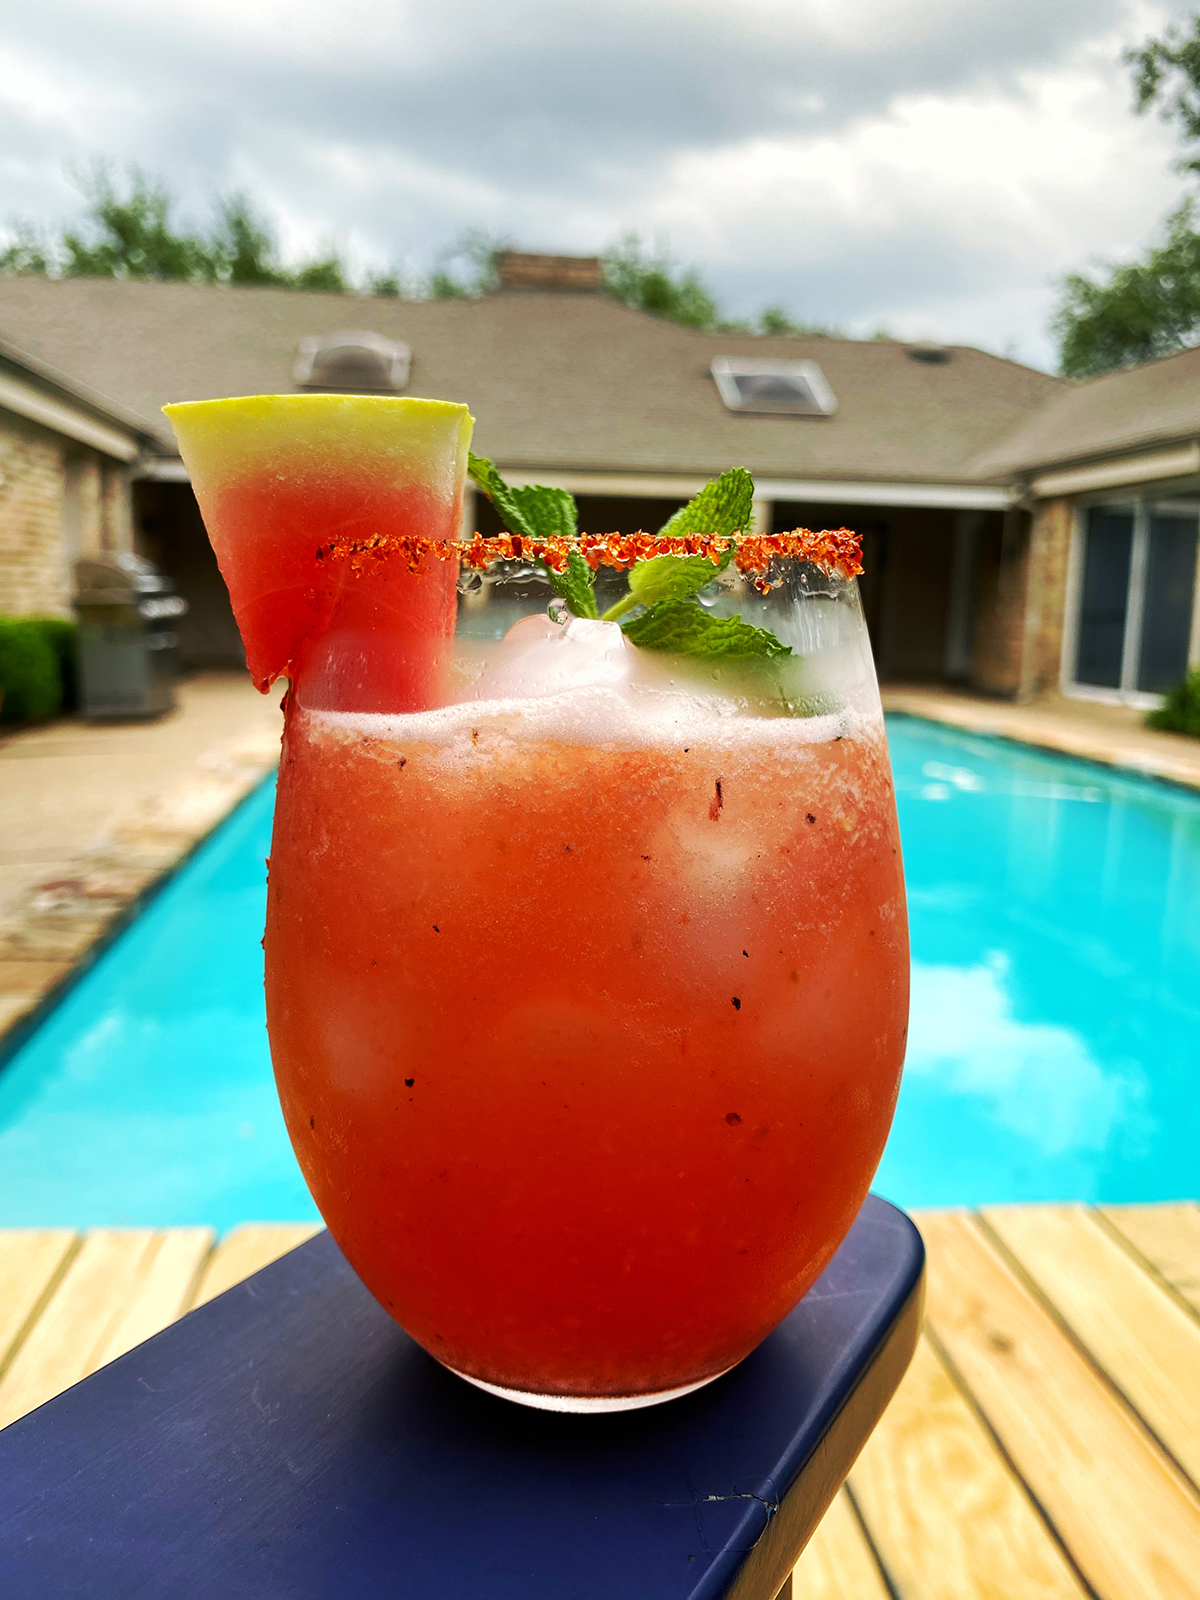 Borson Family Grilled Watermelon and Peach Margarita - Happy Hour at the Borson House